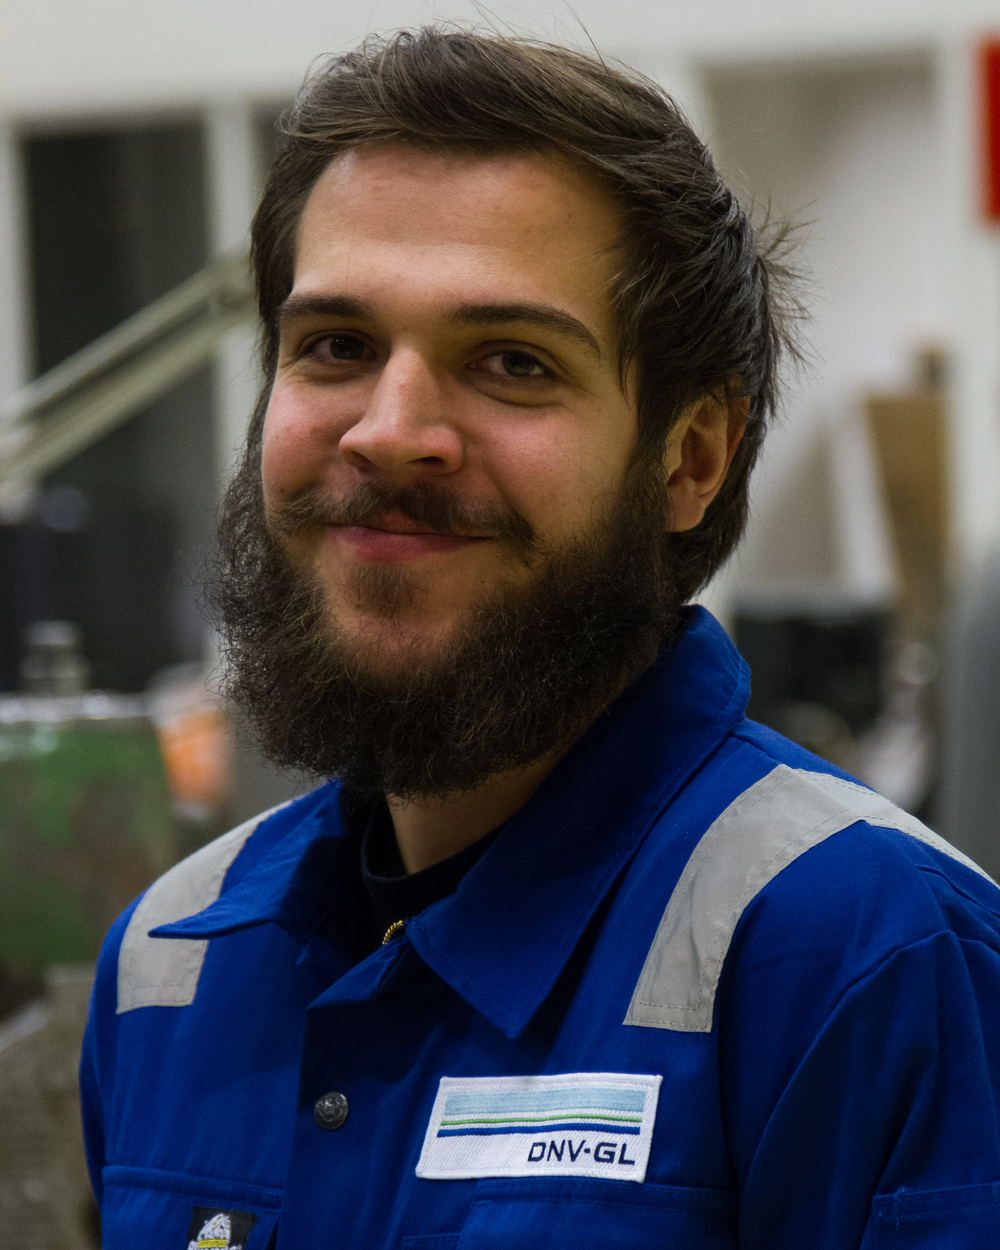 Emil Edwin -Mechanical Engineer Studies: bachelor Mechanical Engineer Campus: HiST Hometown: Norway